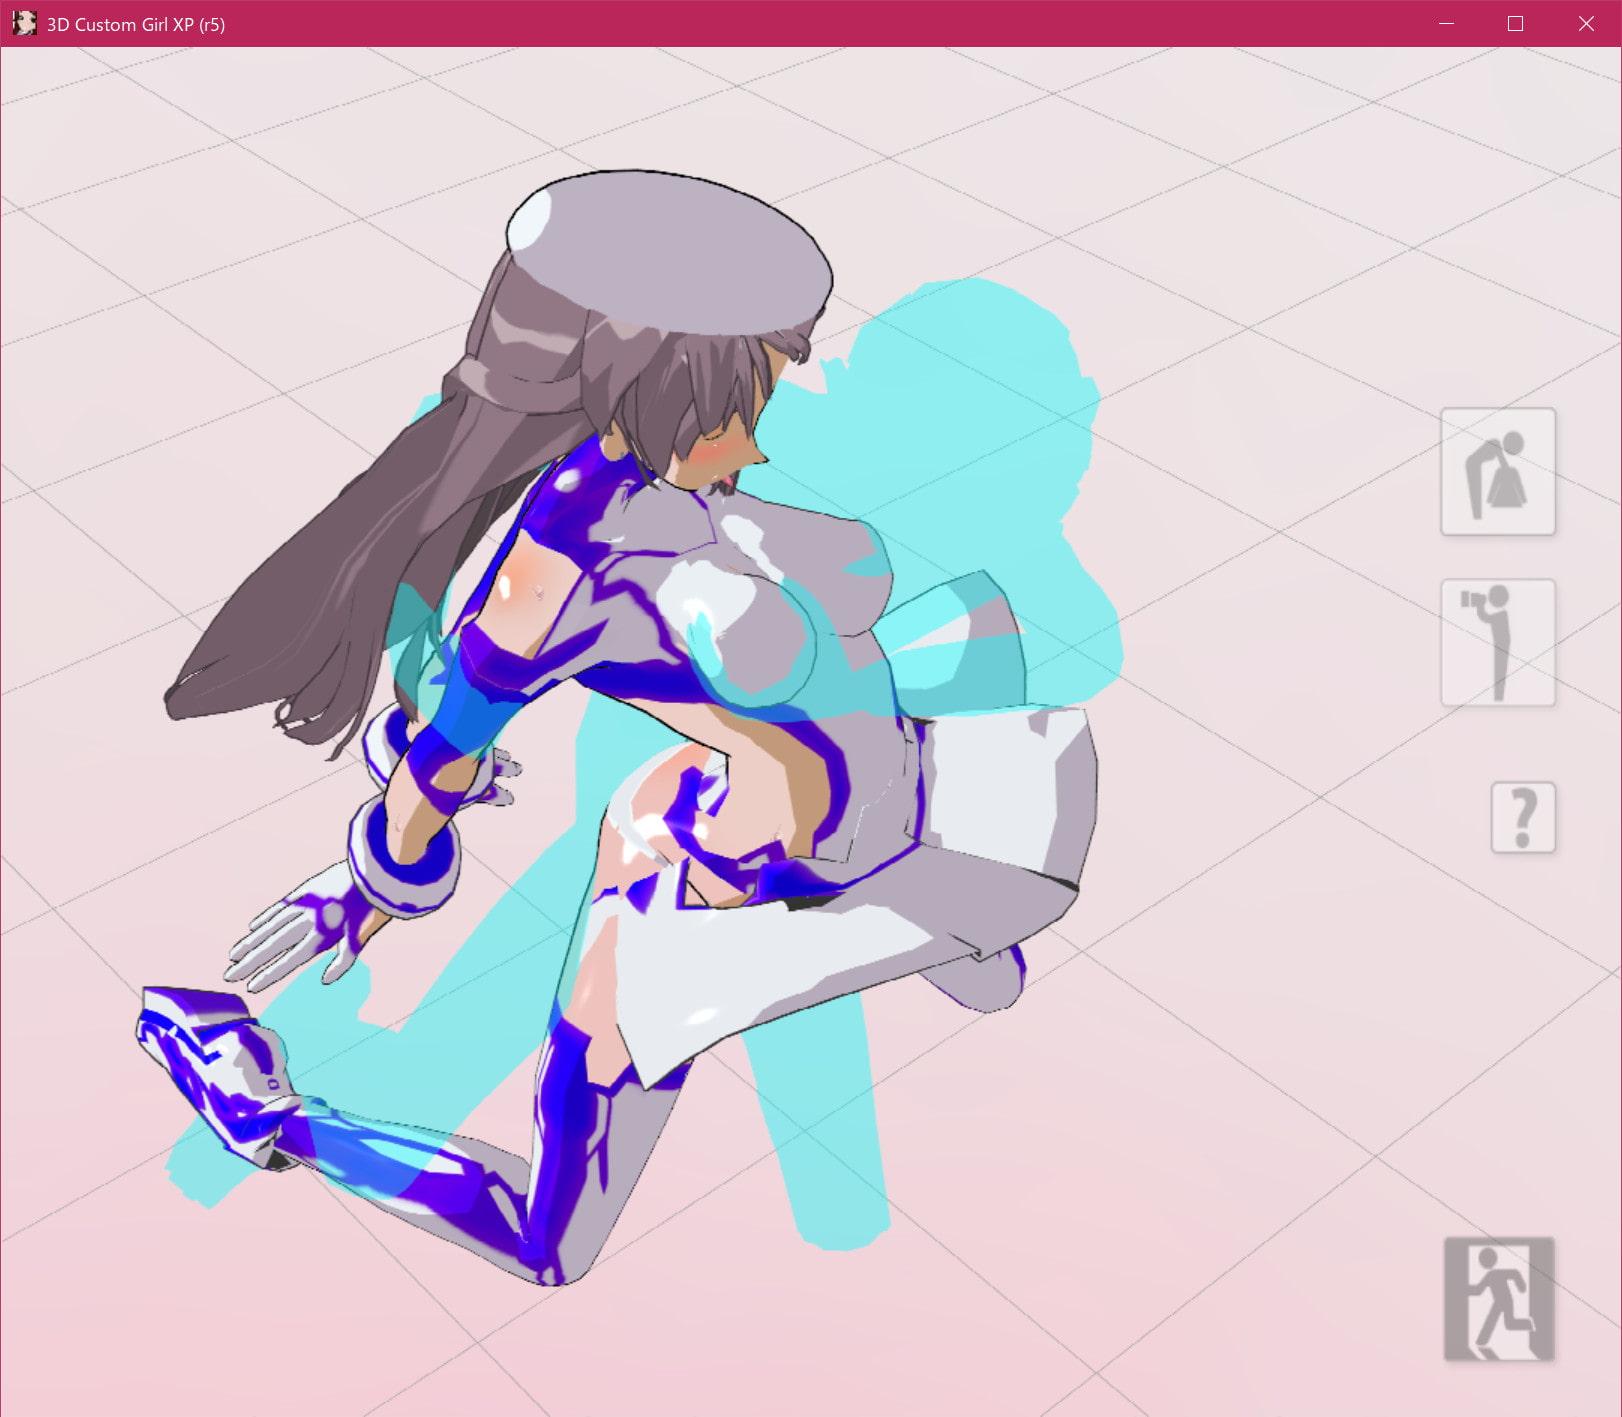 3Dカスタム少女改変モーション(バックモーション)SmallPack1